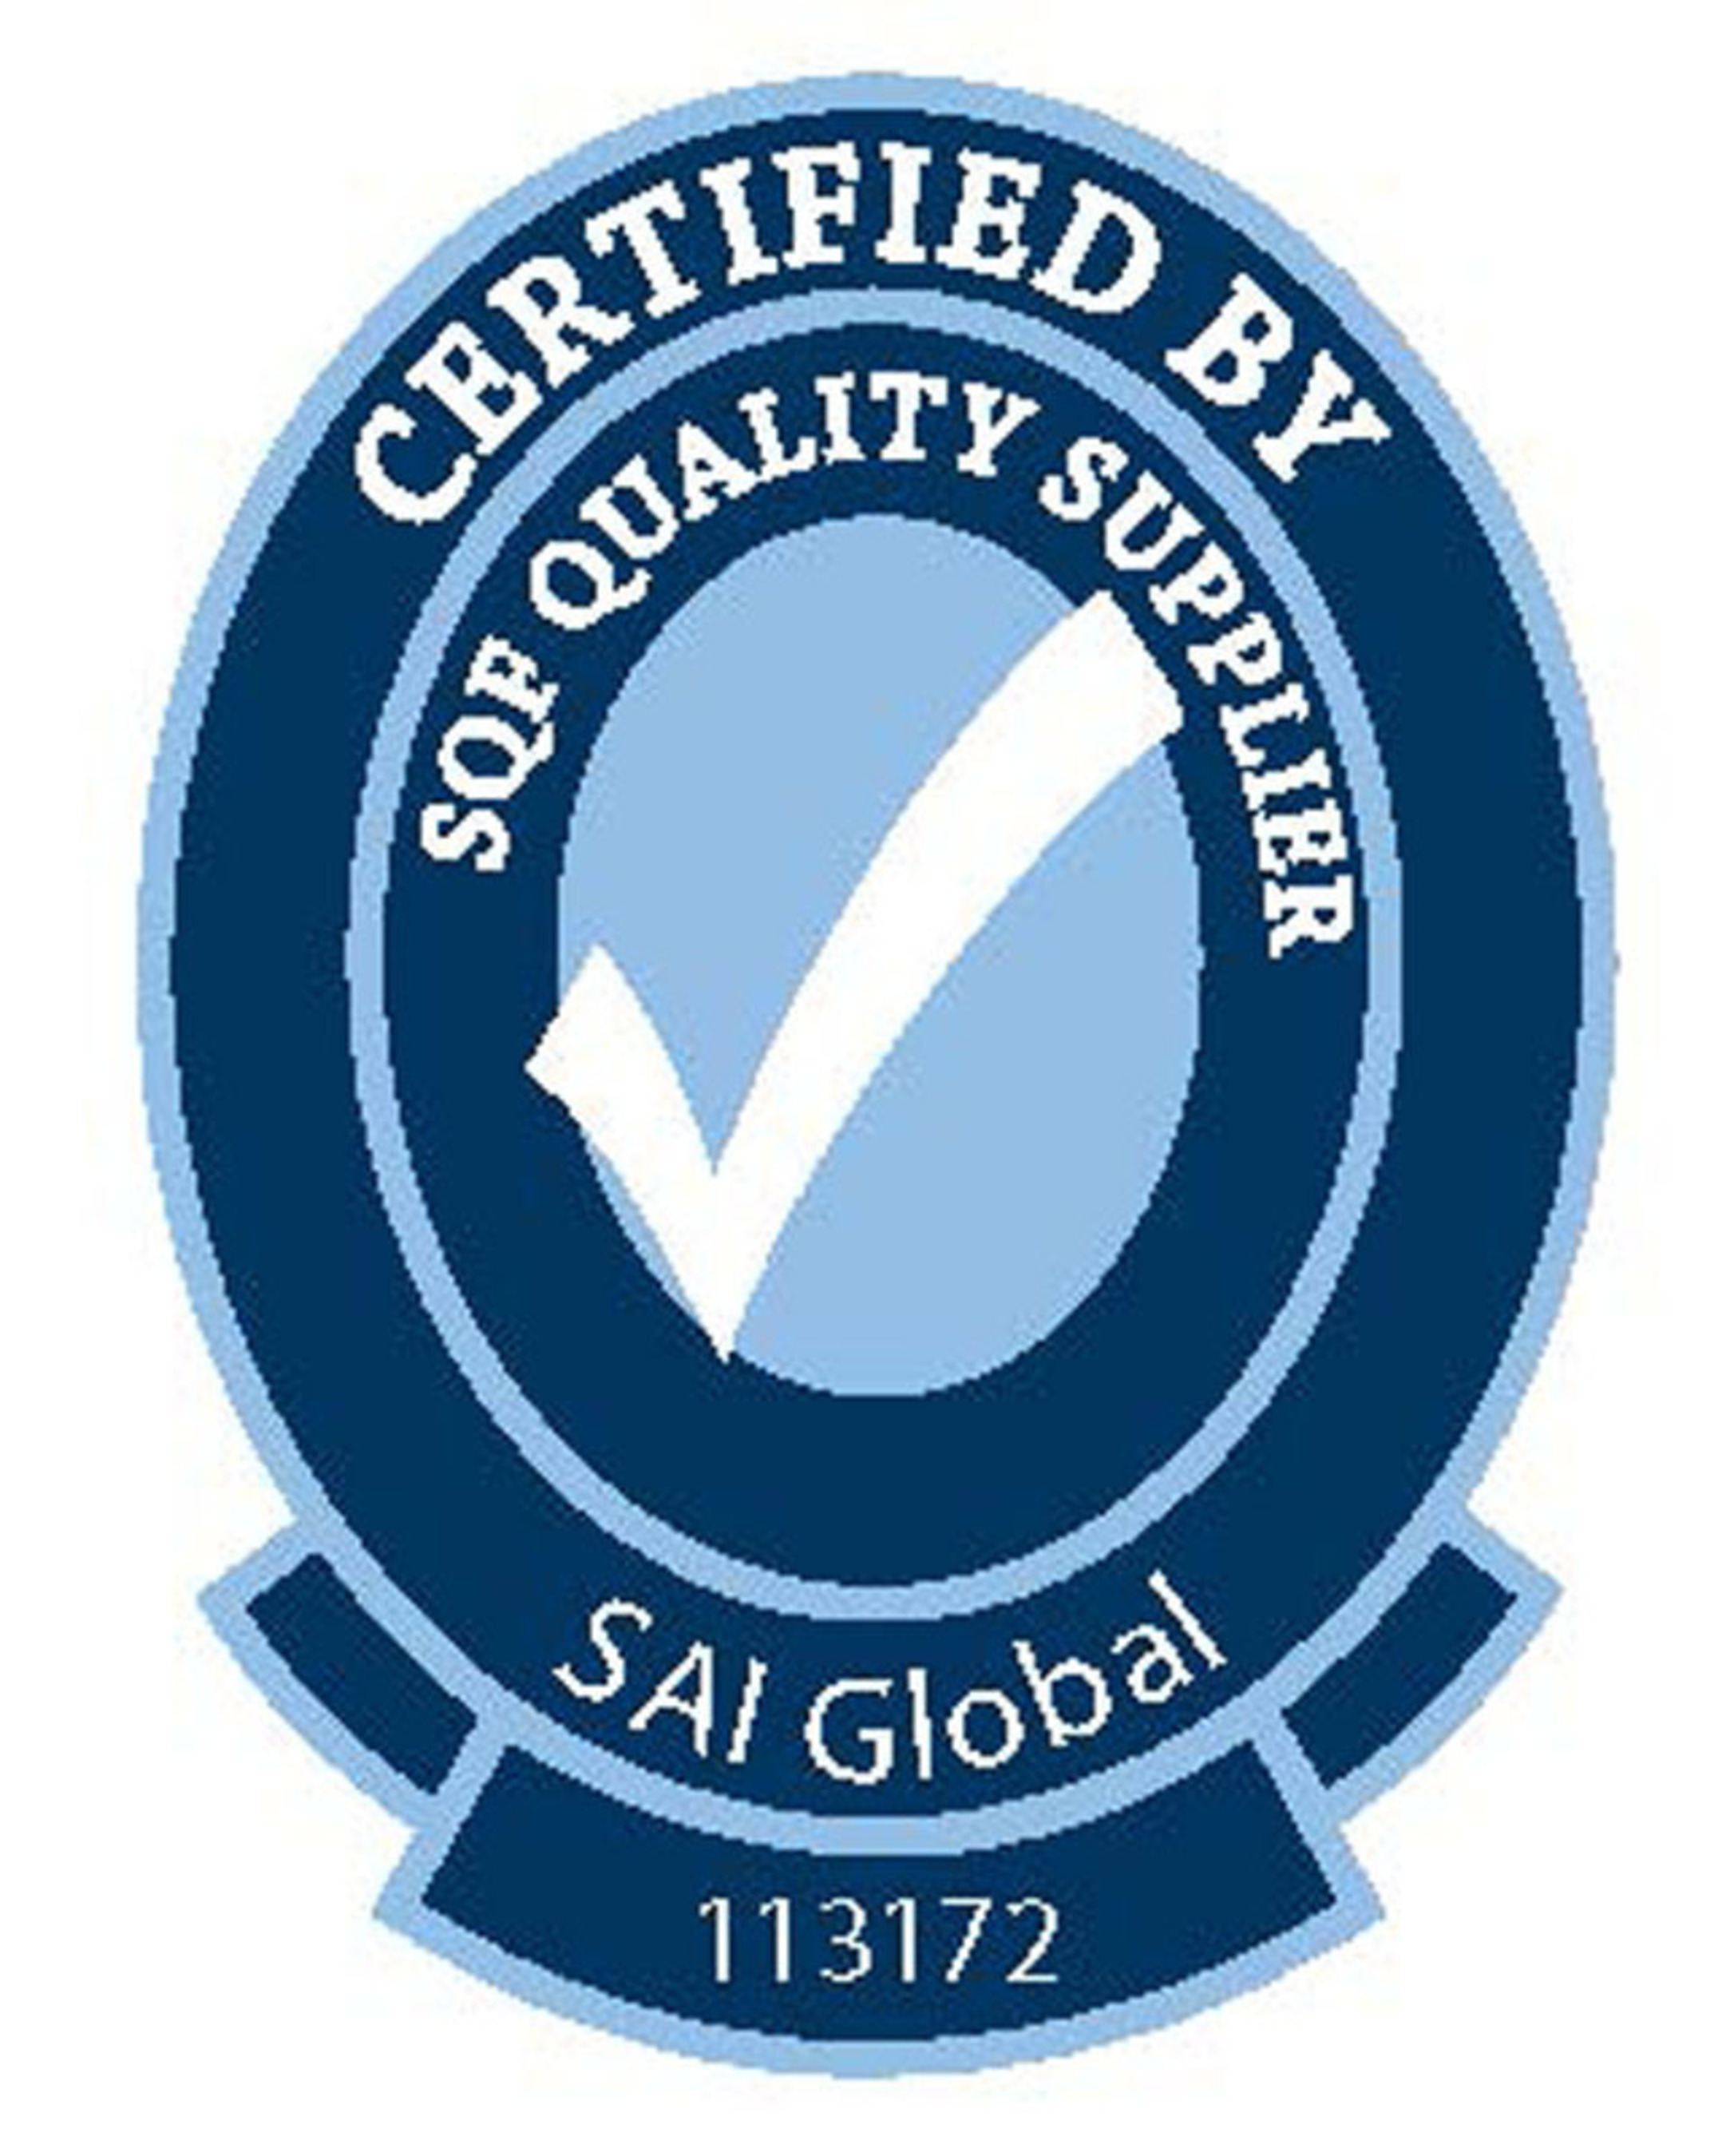 Savory Creations International quality shield. (PRNewsFoto/Savory Creations International) (PRNewsFoto/SAVORY CREATIONS INTERNATIONAL)